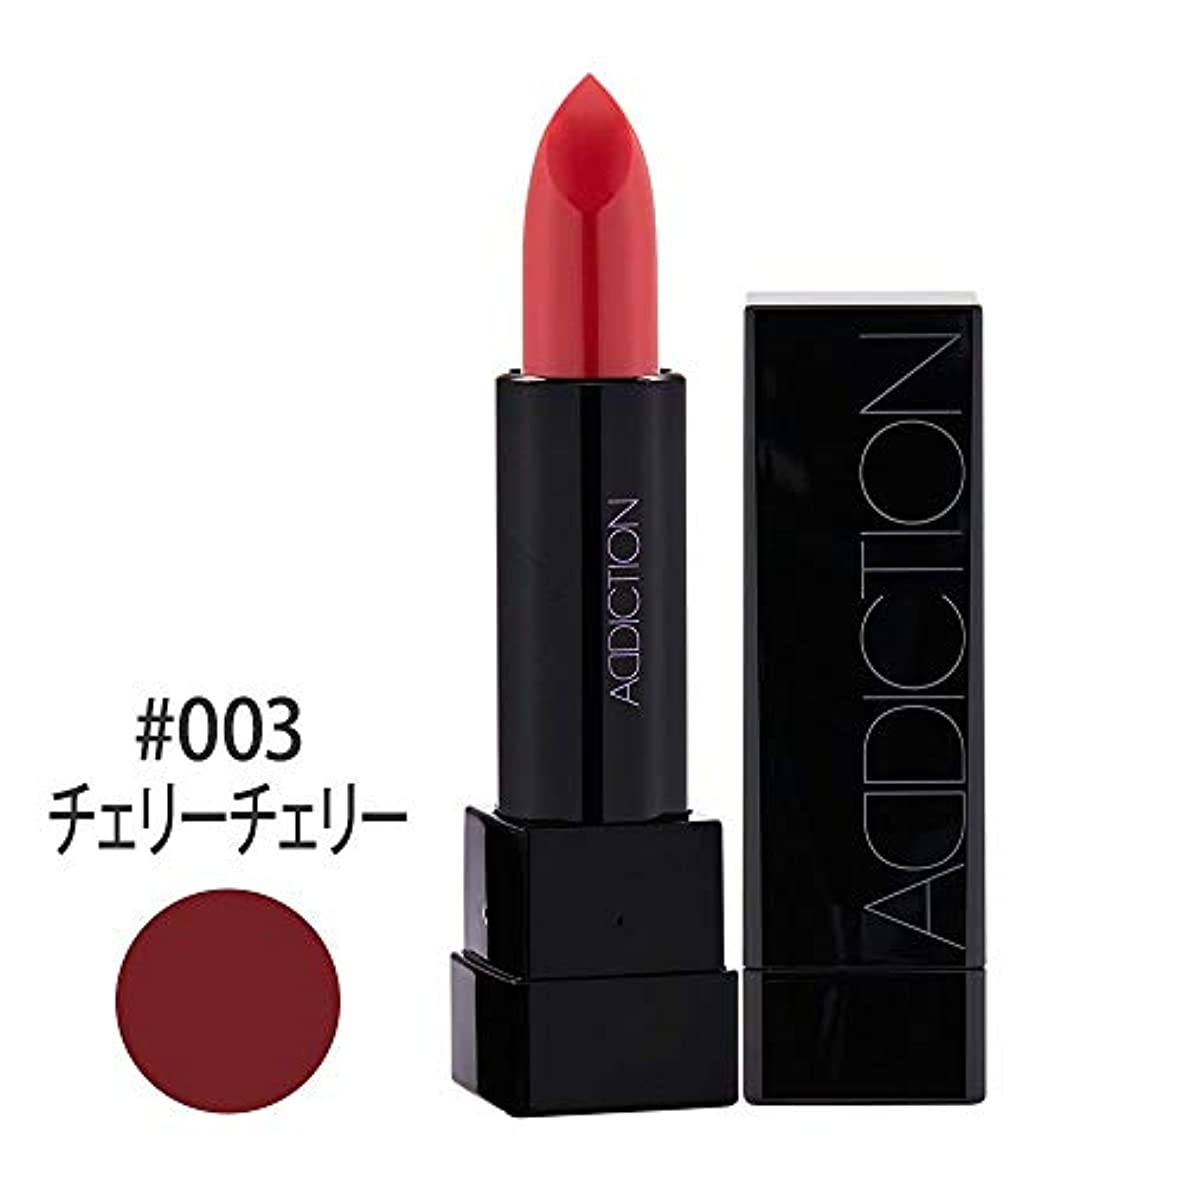 ADDICTION アディクション リップスティック シアー #003 Cherry Cherry 3.8g [並行輸入品]